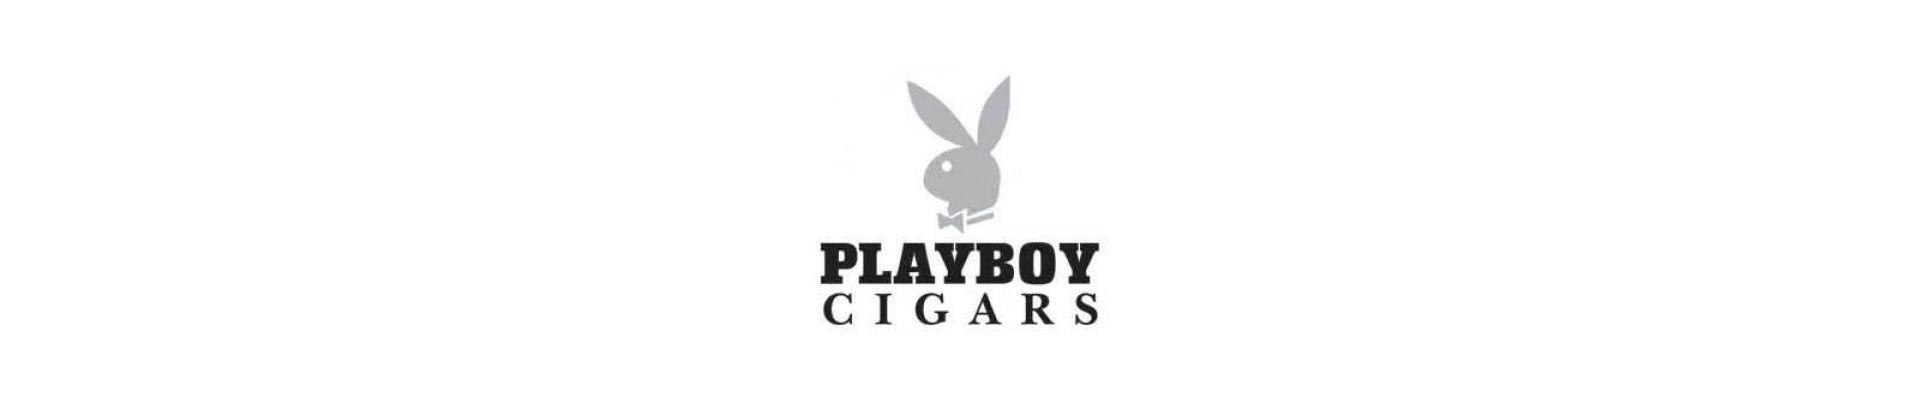 Trabucuri Playboy Trabucuri Playboy Robusto pret trabucuri.